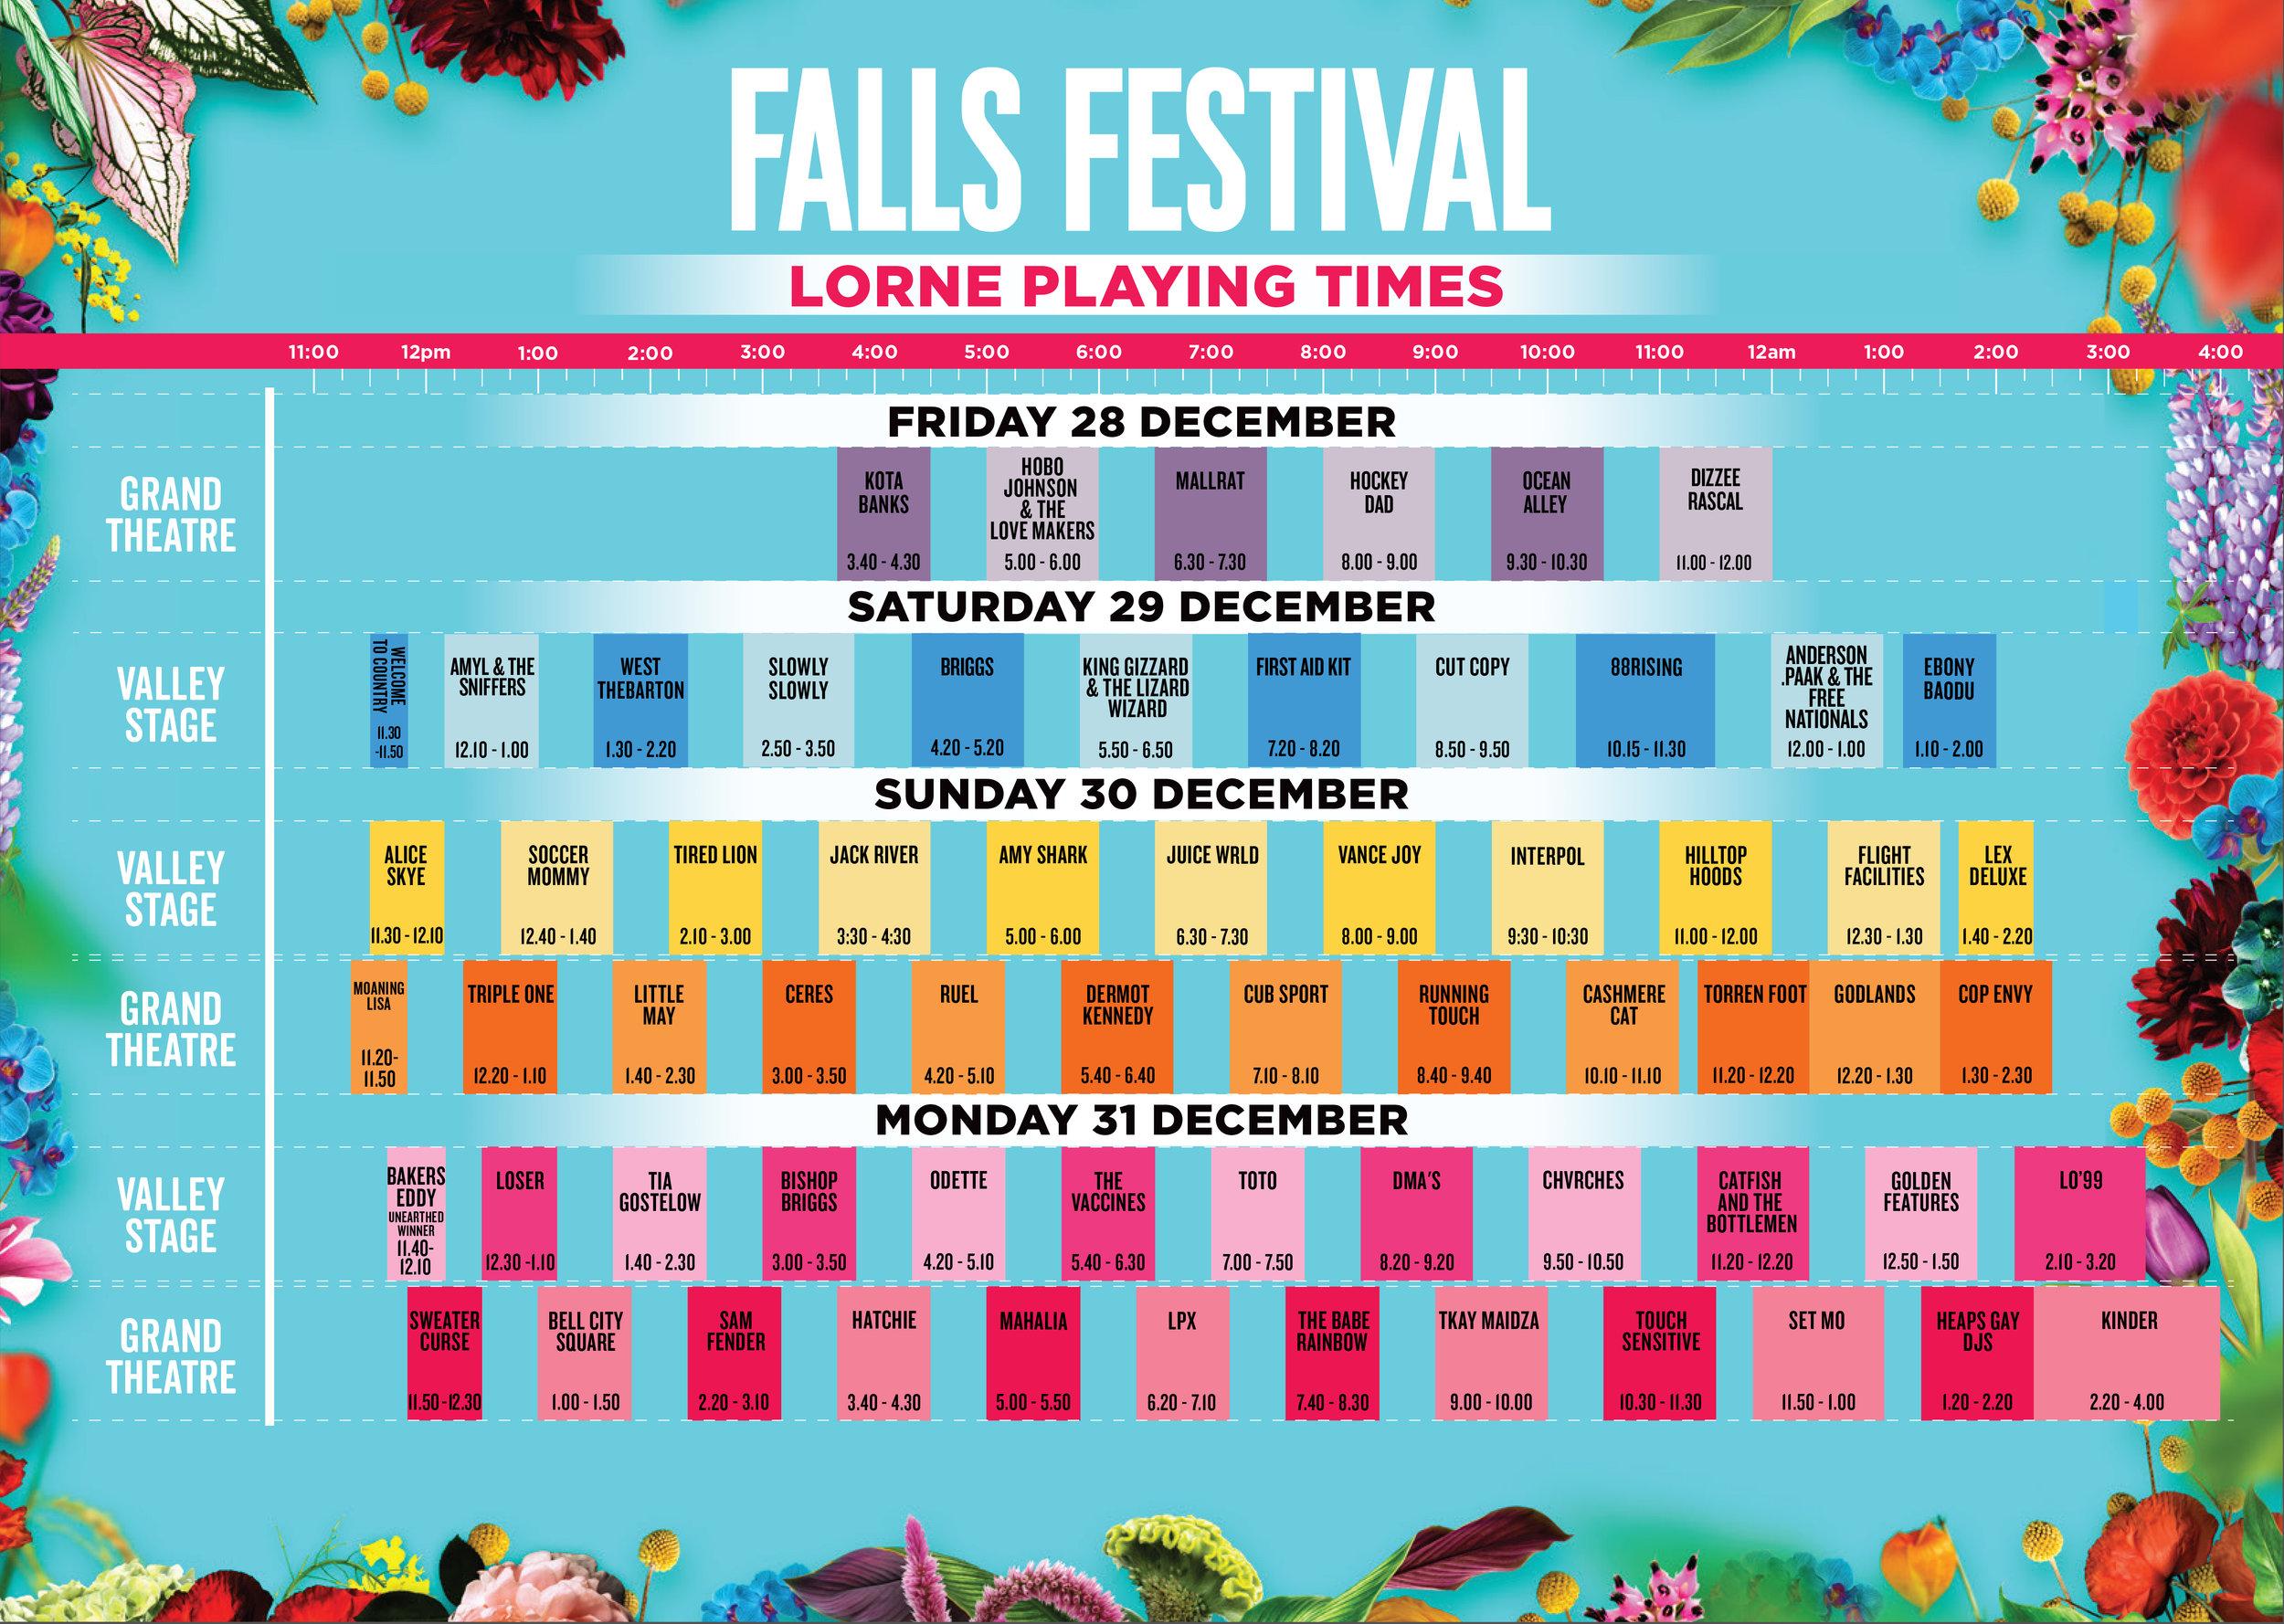 FALLS_2018_PlayingTimes_Lorne_1712_03.jpg